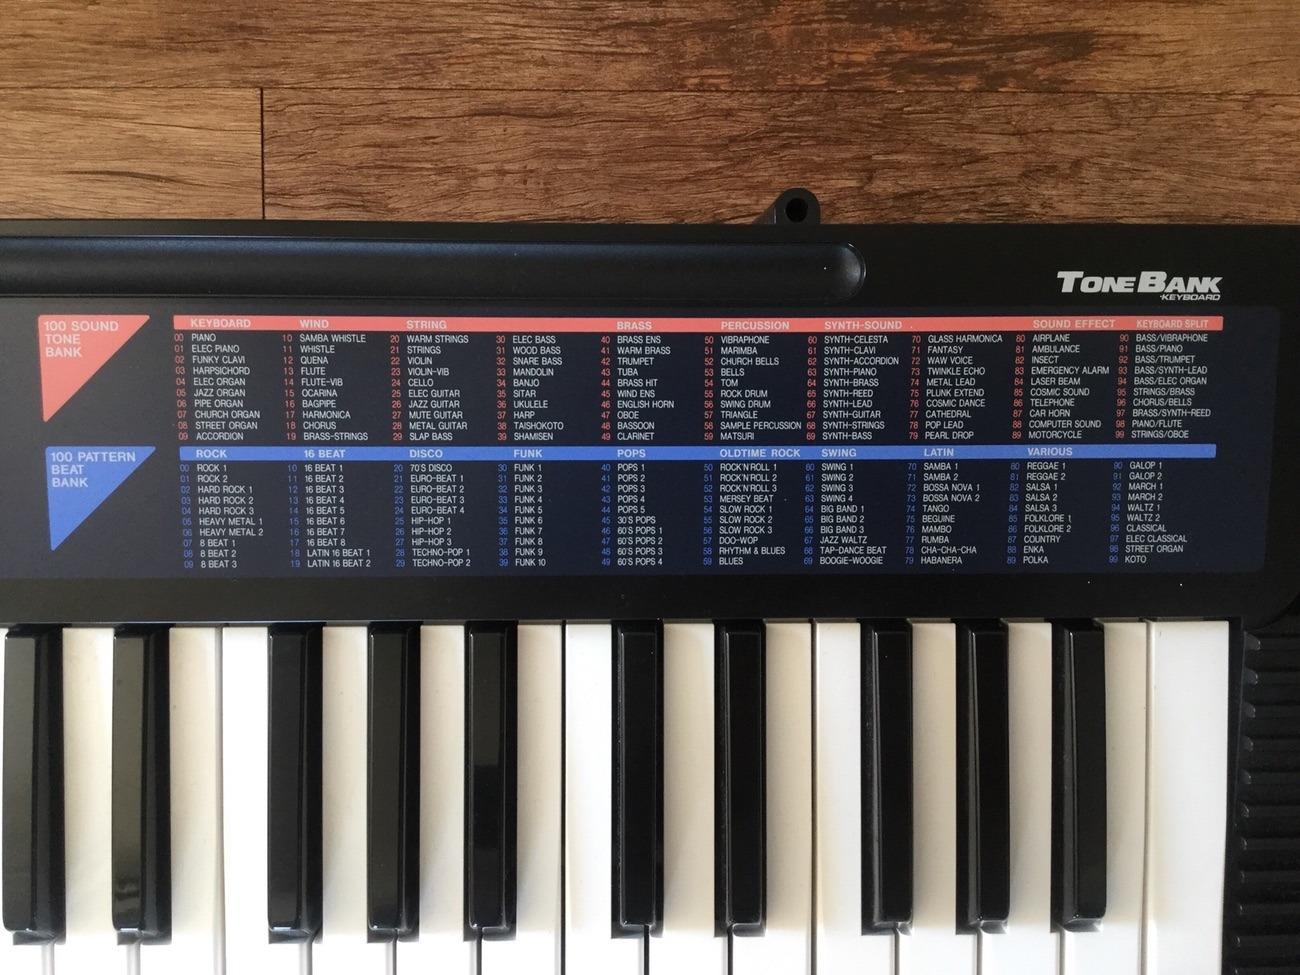 Casio CA-110 Tone Bank Keyboard